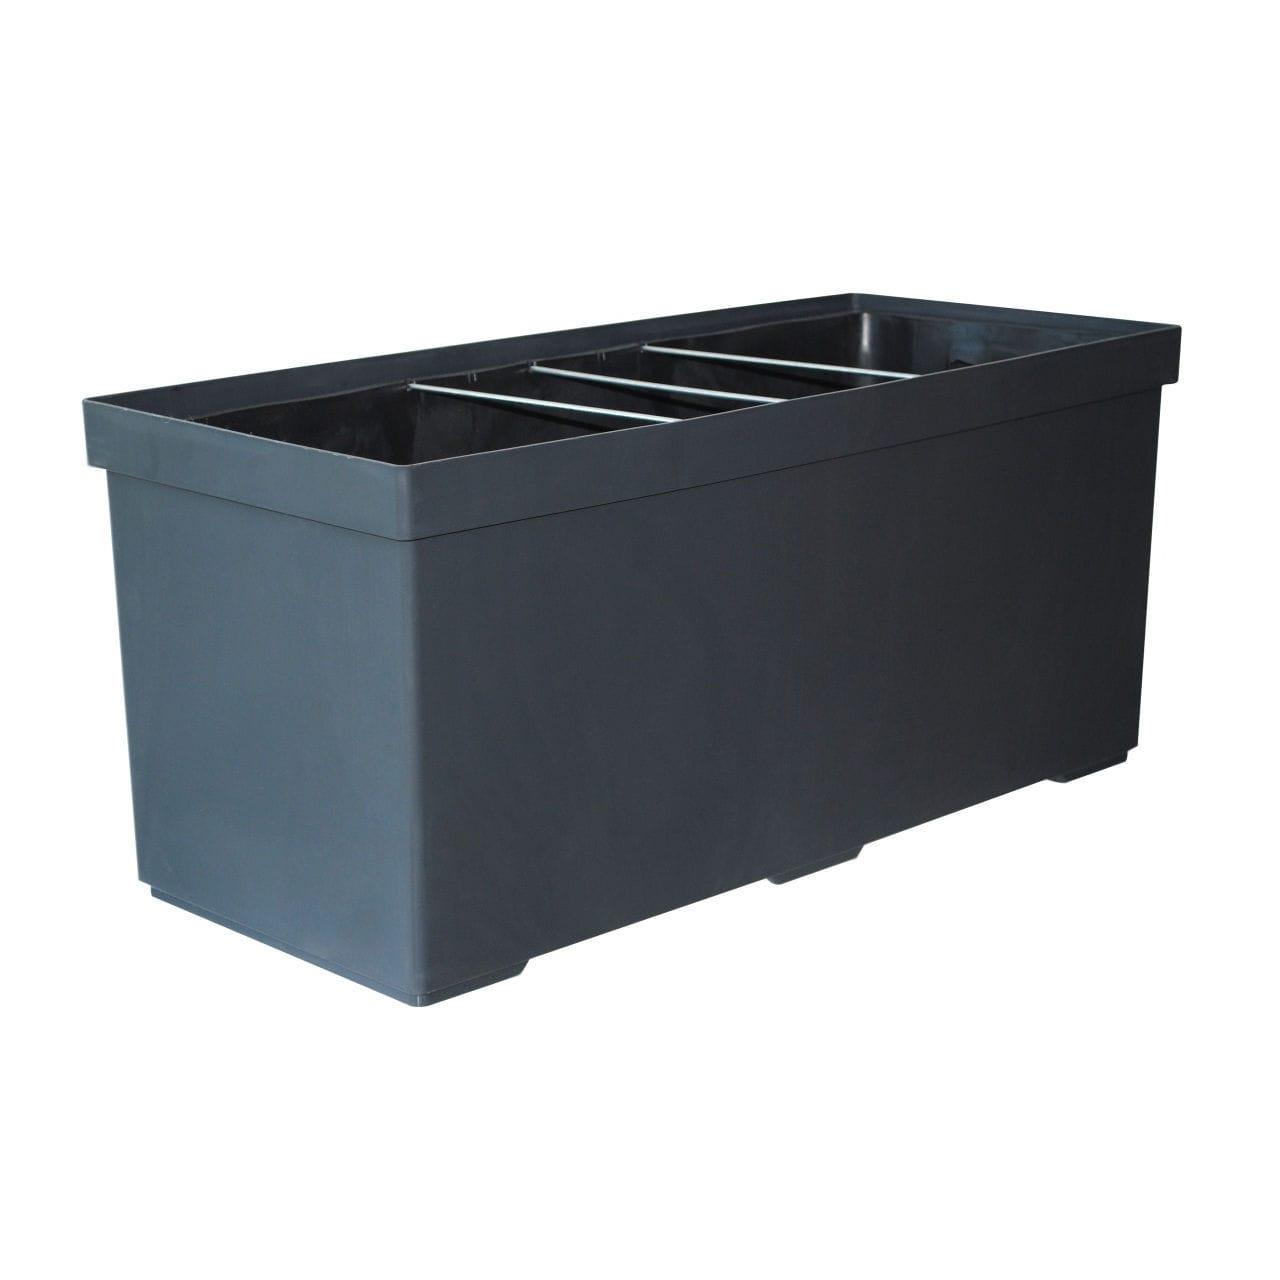 kunststoff-pflanzkübel / rechteckig / modern - carina - pasquini & bini